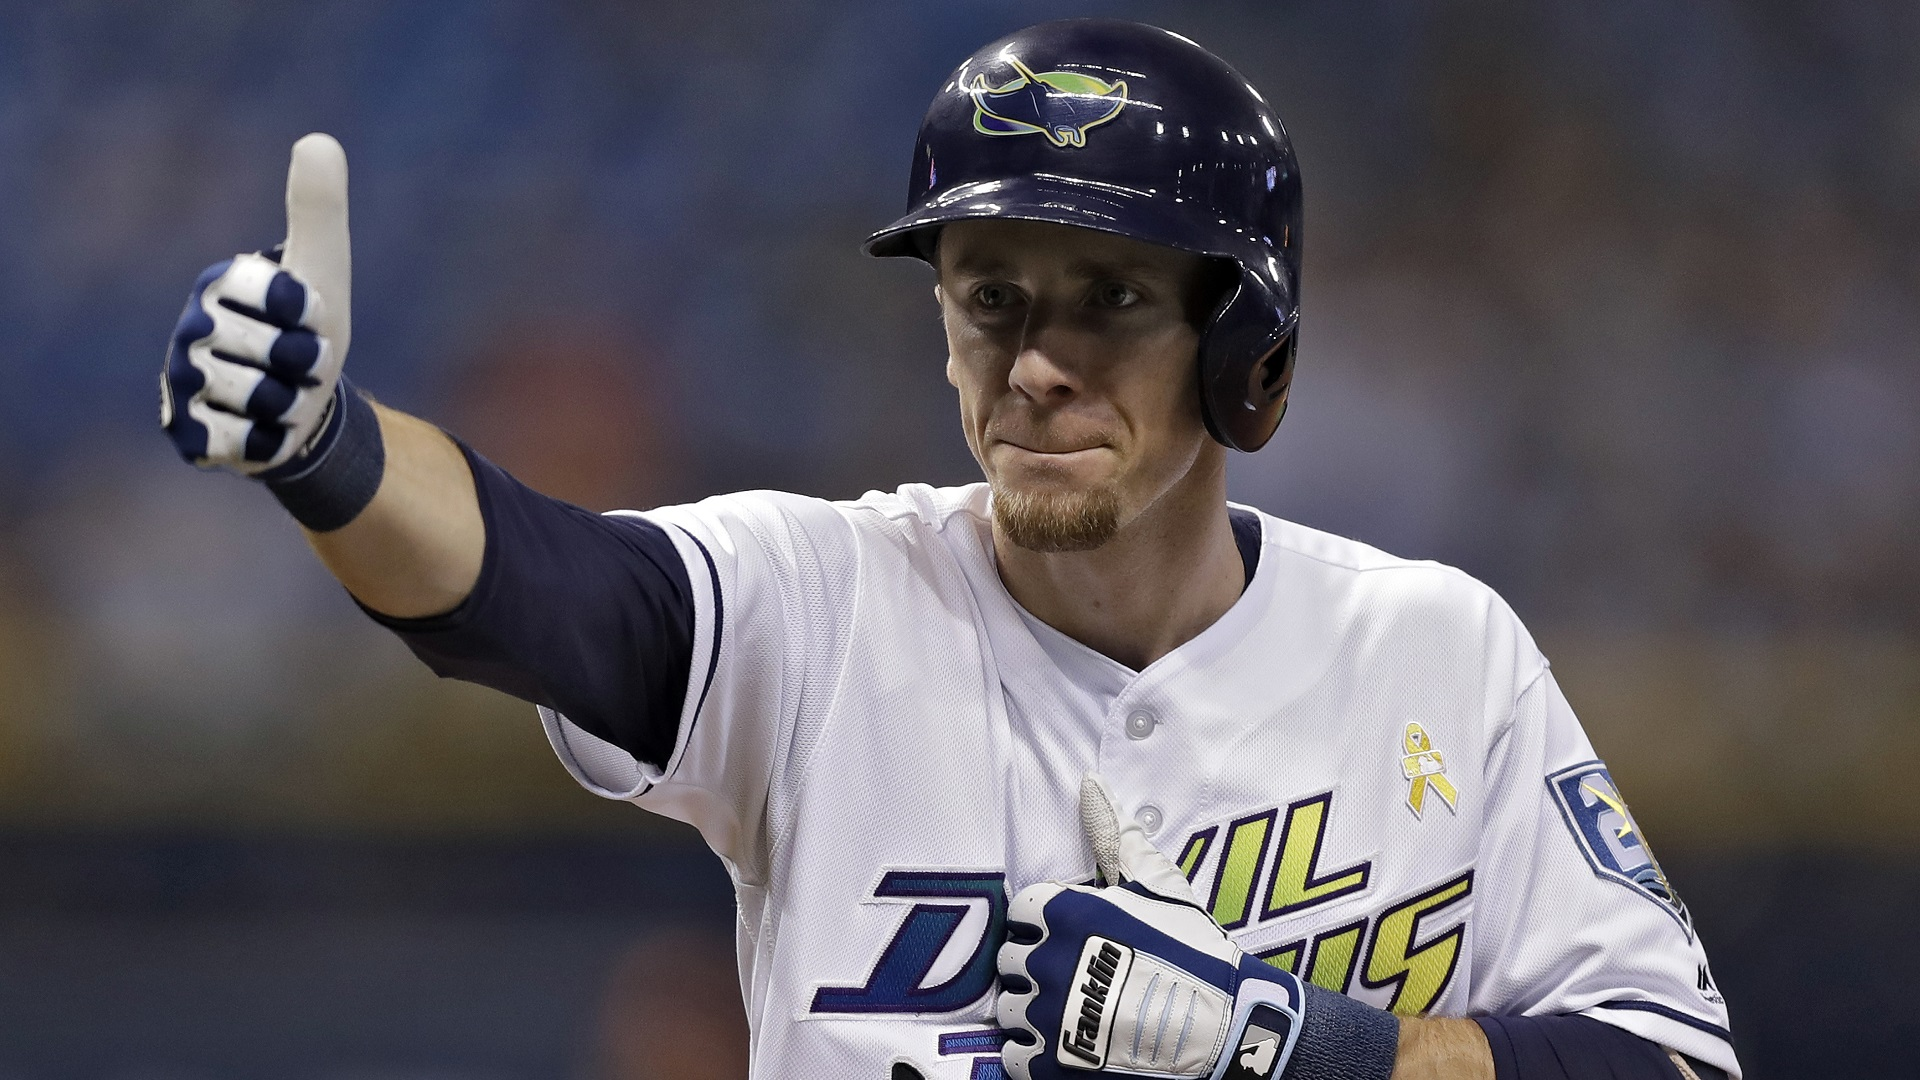 Orioles Rays Baseball_1536496282399